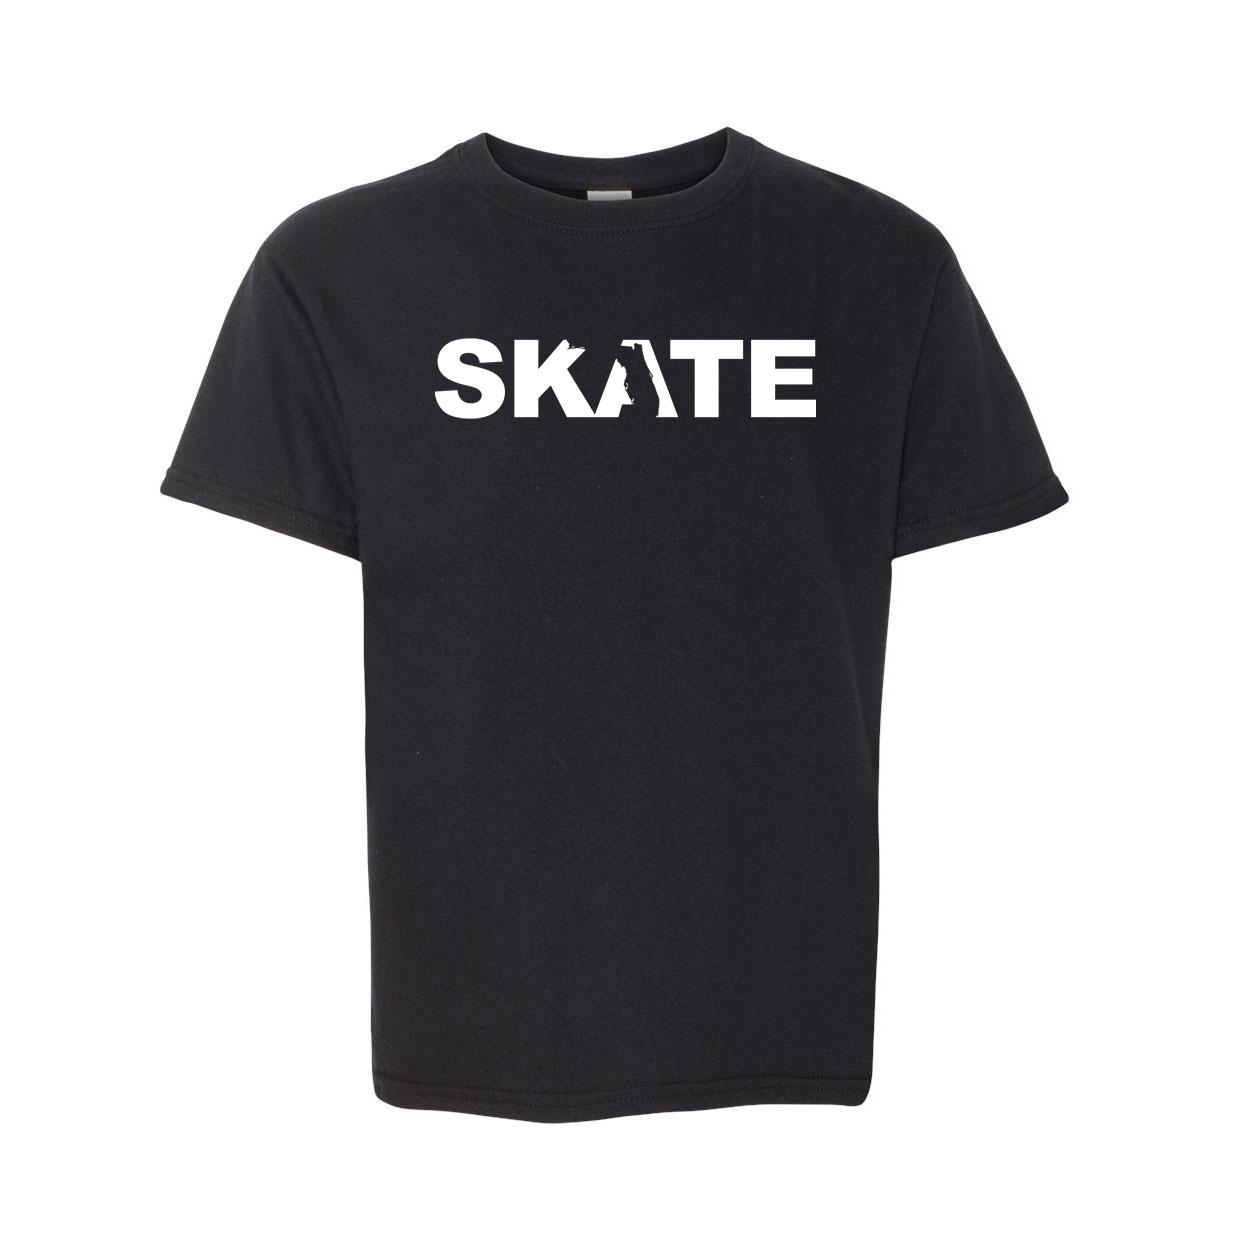 Skate Florida Classic Youth T-Shirt Black (White Logo)